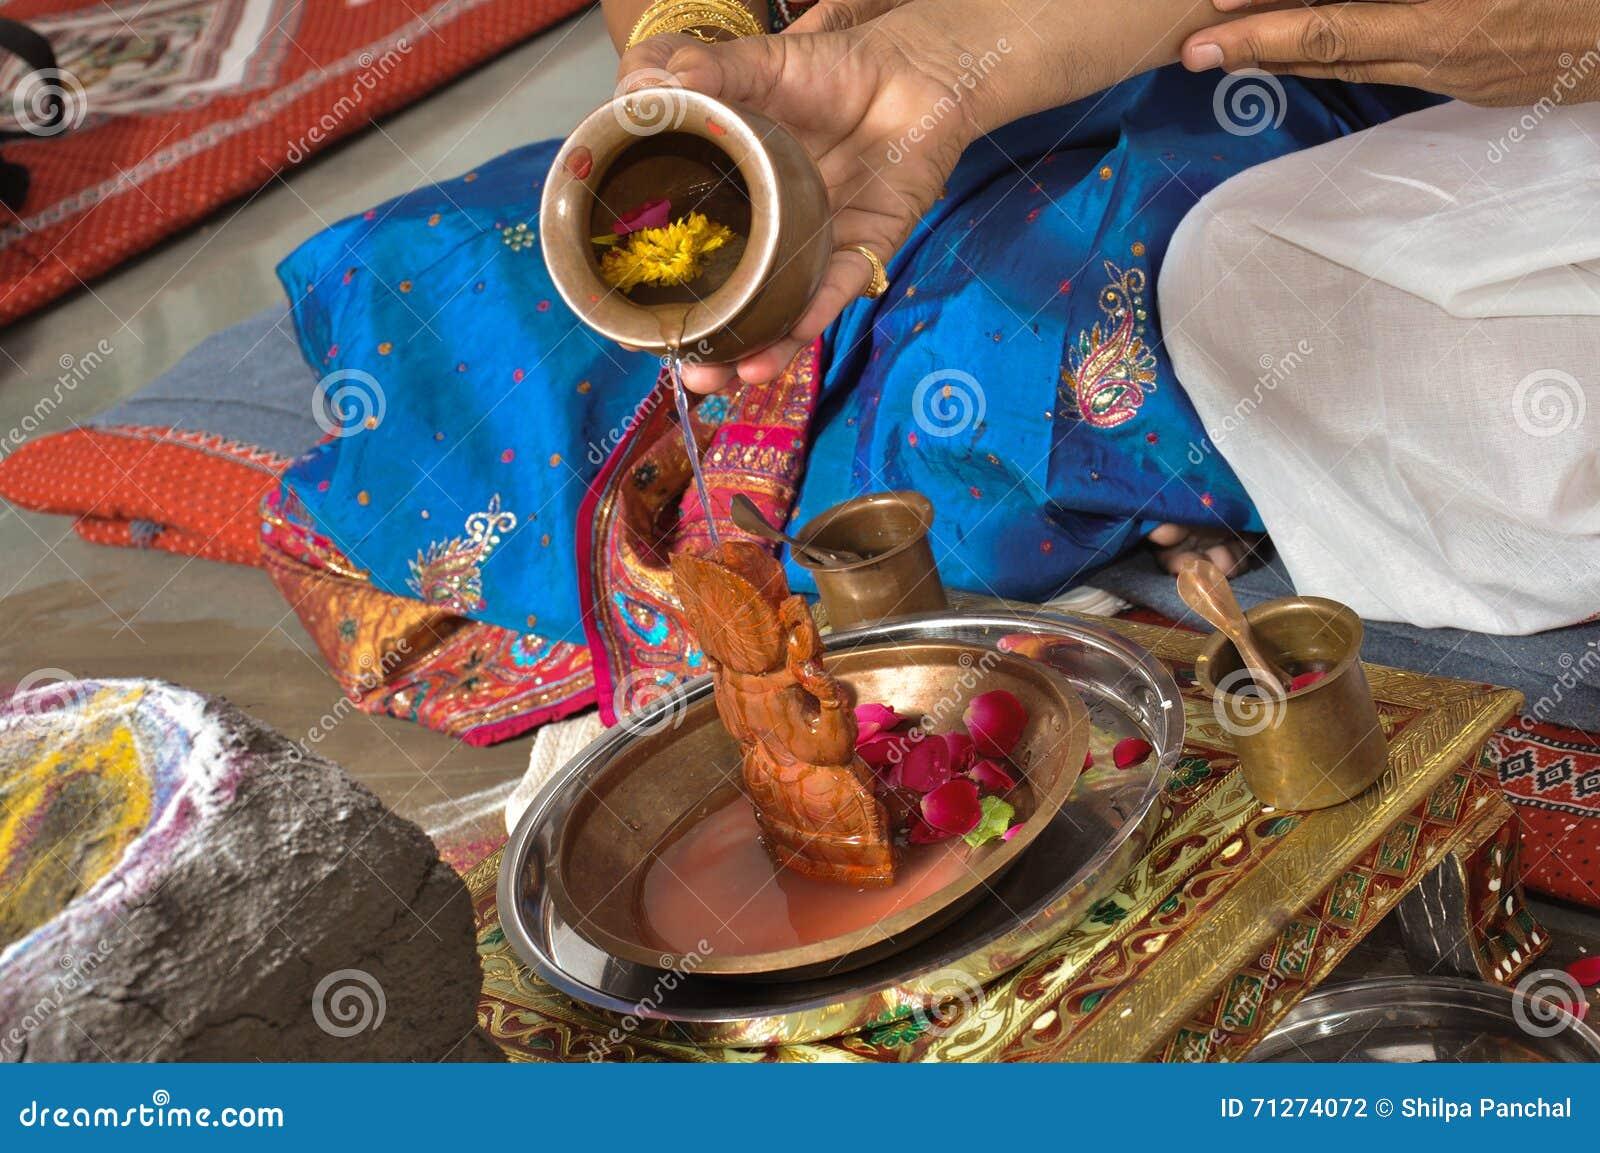 Men Doing Pray Of Lord Ganesha Stock Photo - Image of coconut